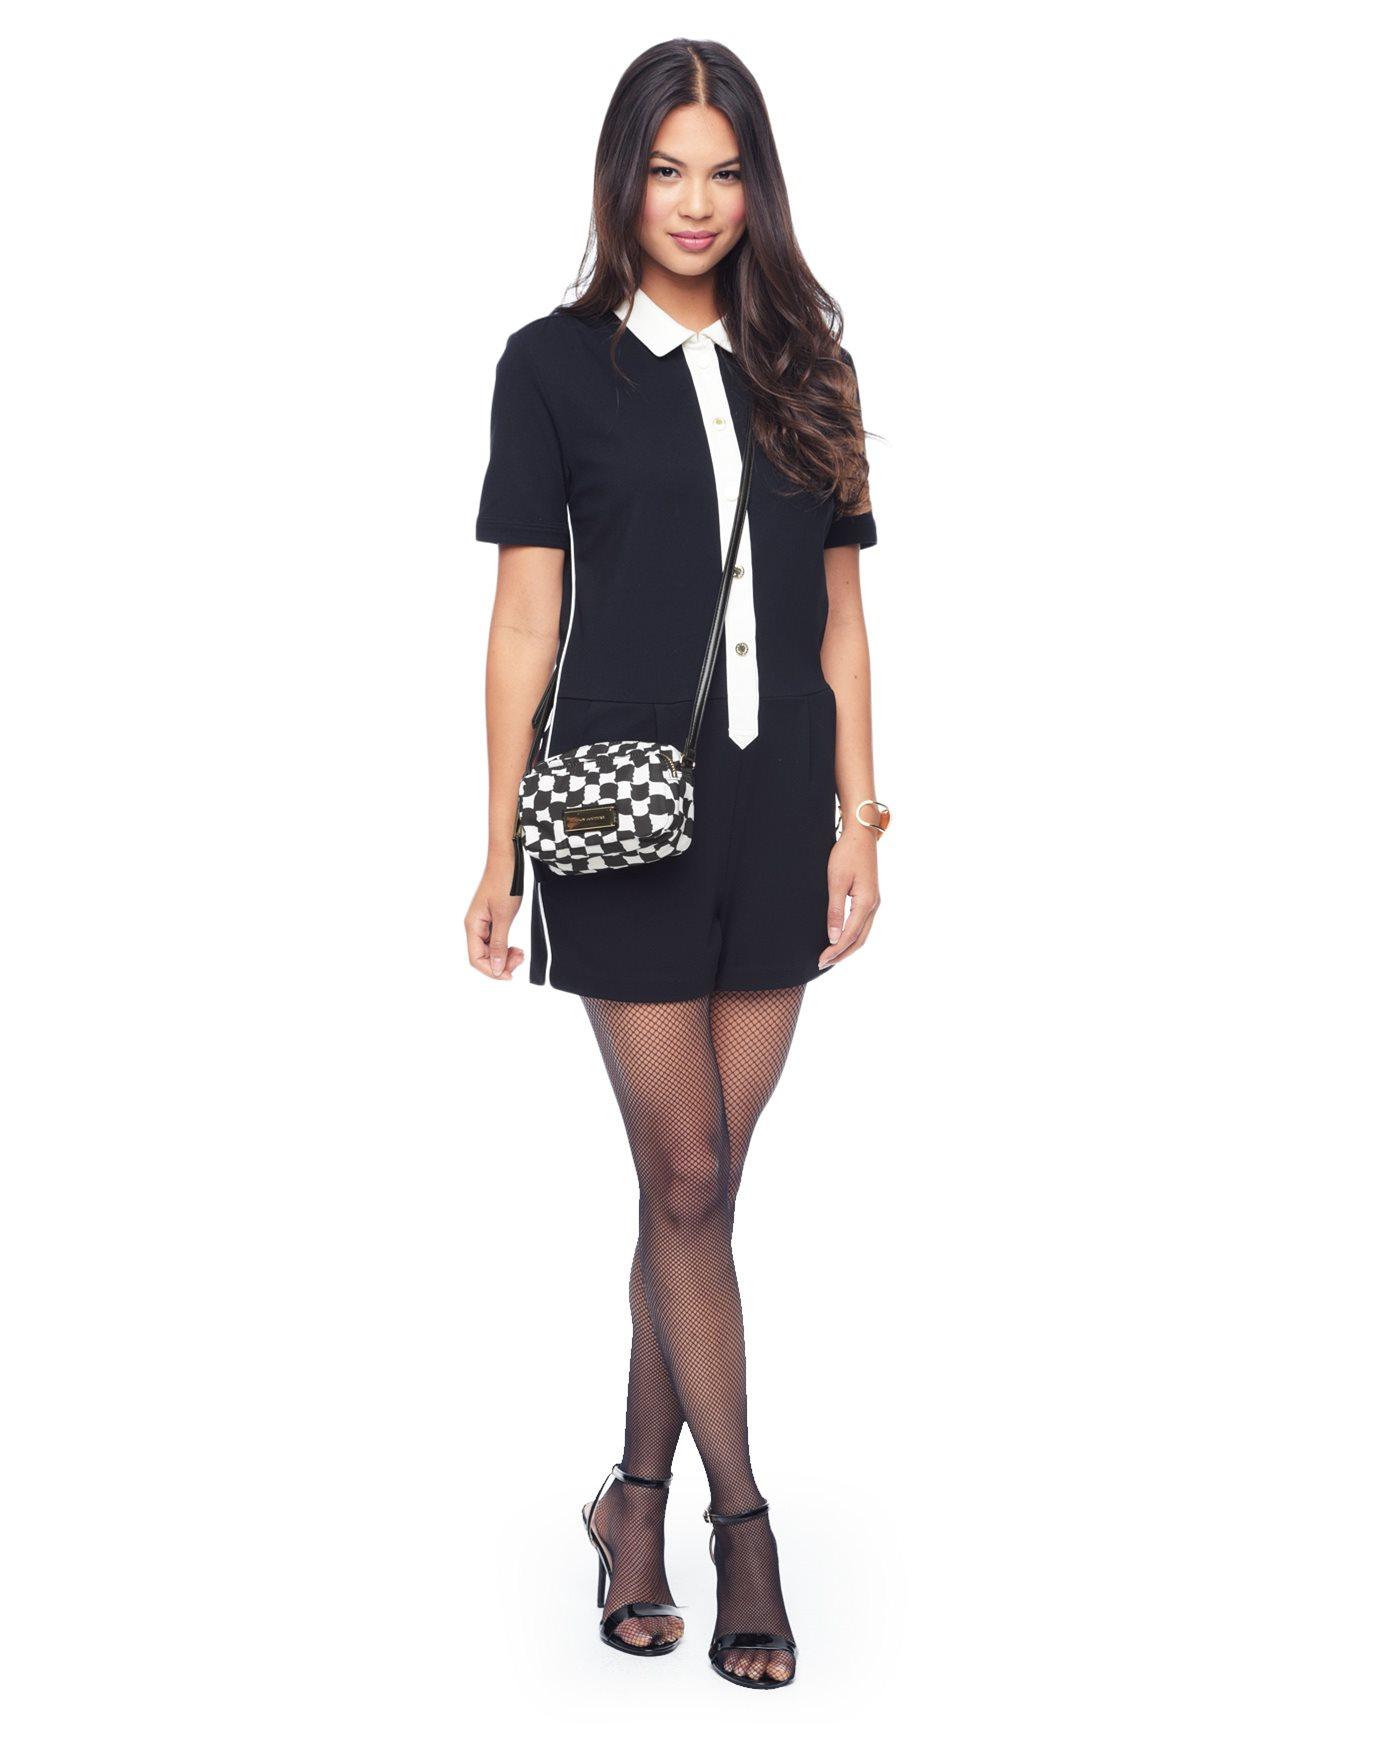 juicy couture nouvelle pop nylon crossbody in black black white lyst. Black Bedroom Furniture Sets. Home Design Ideas